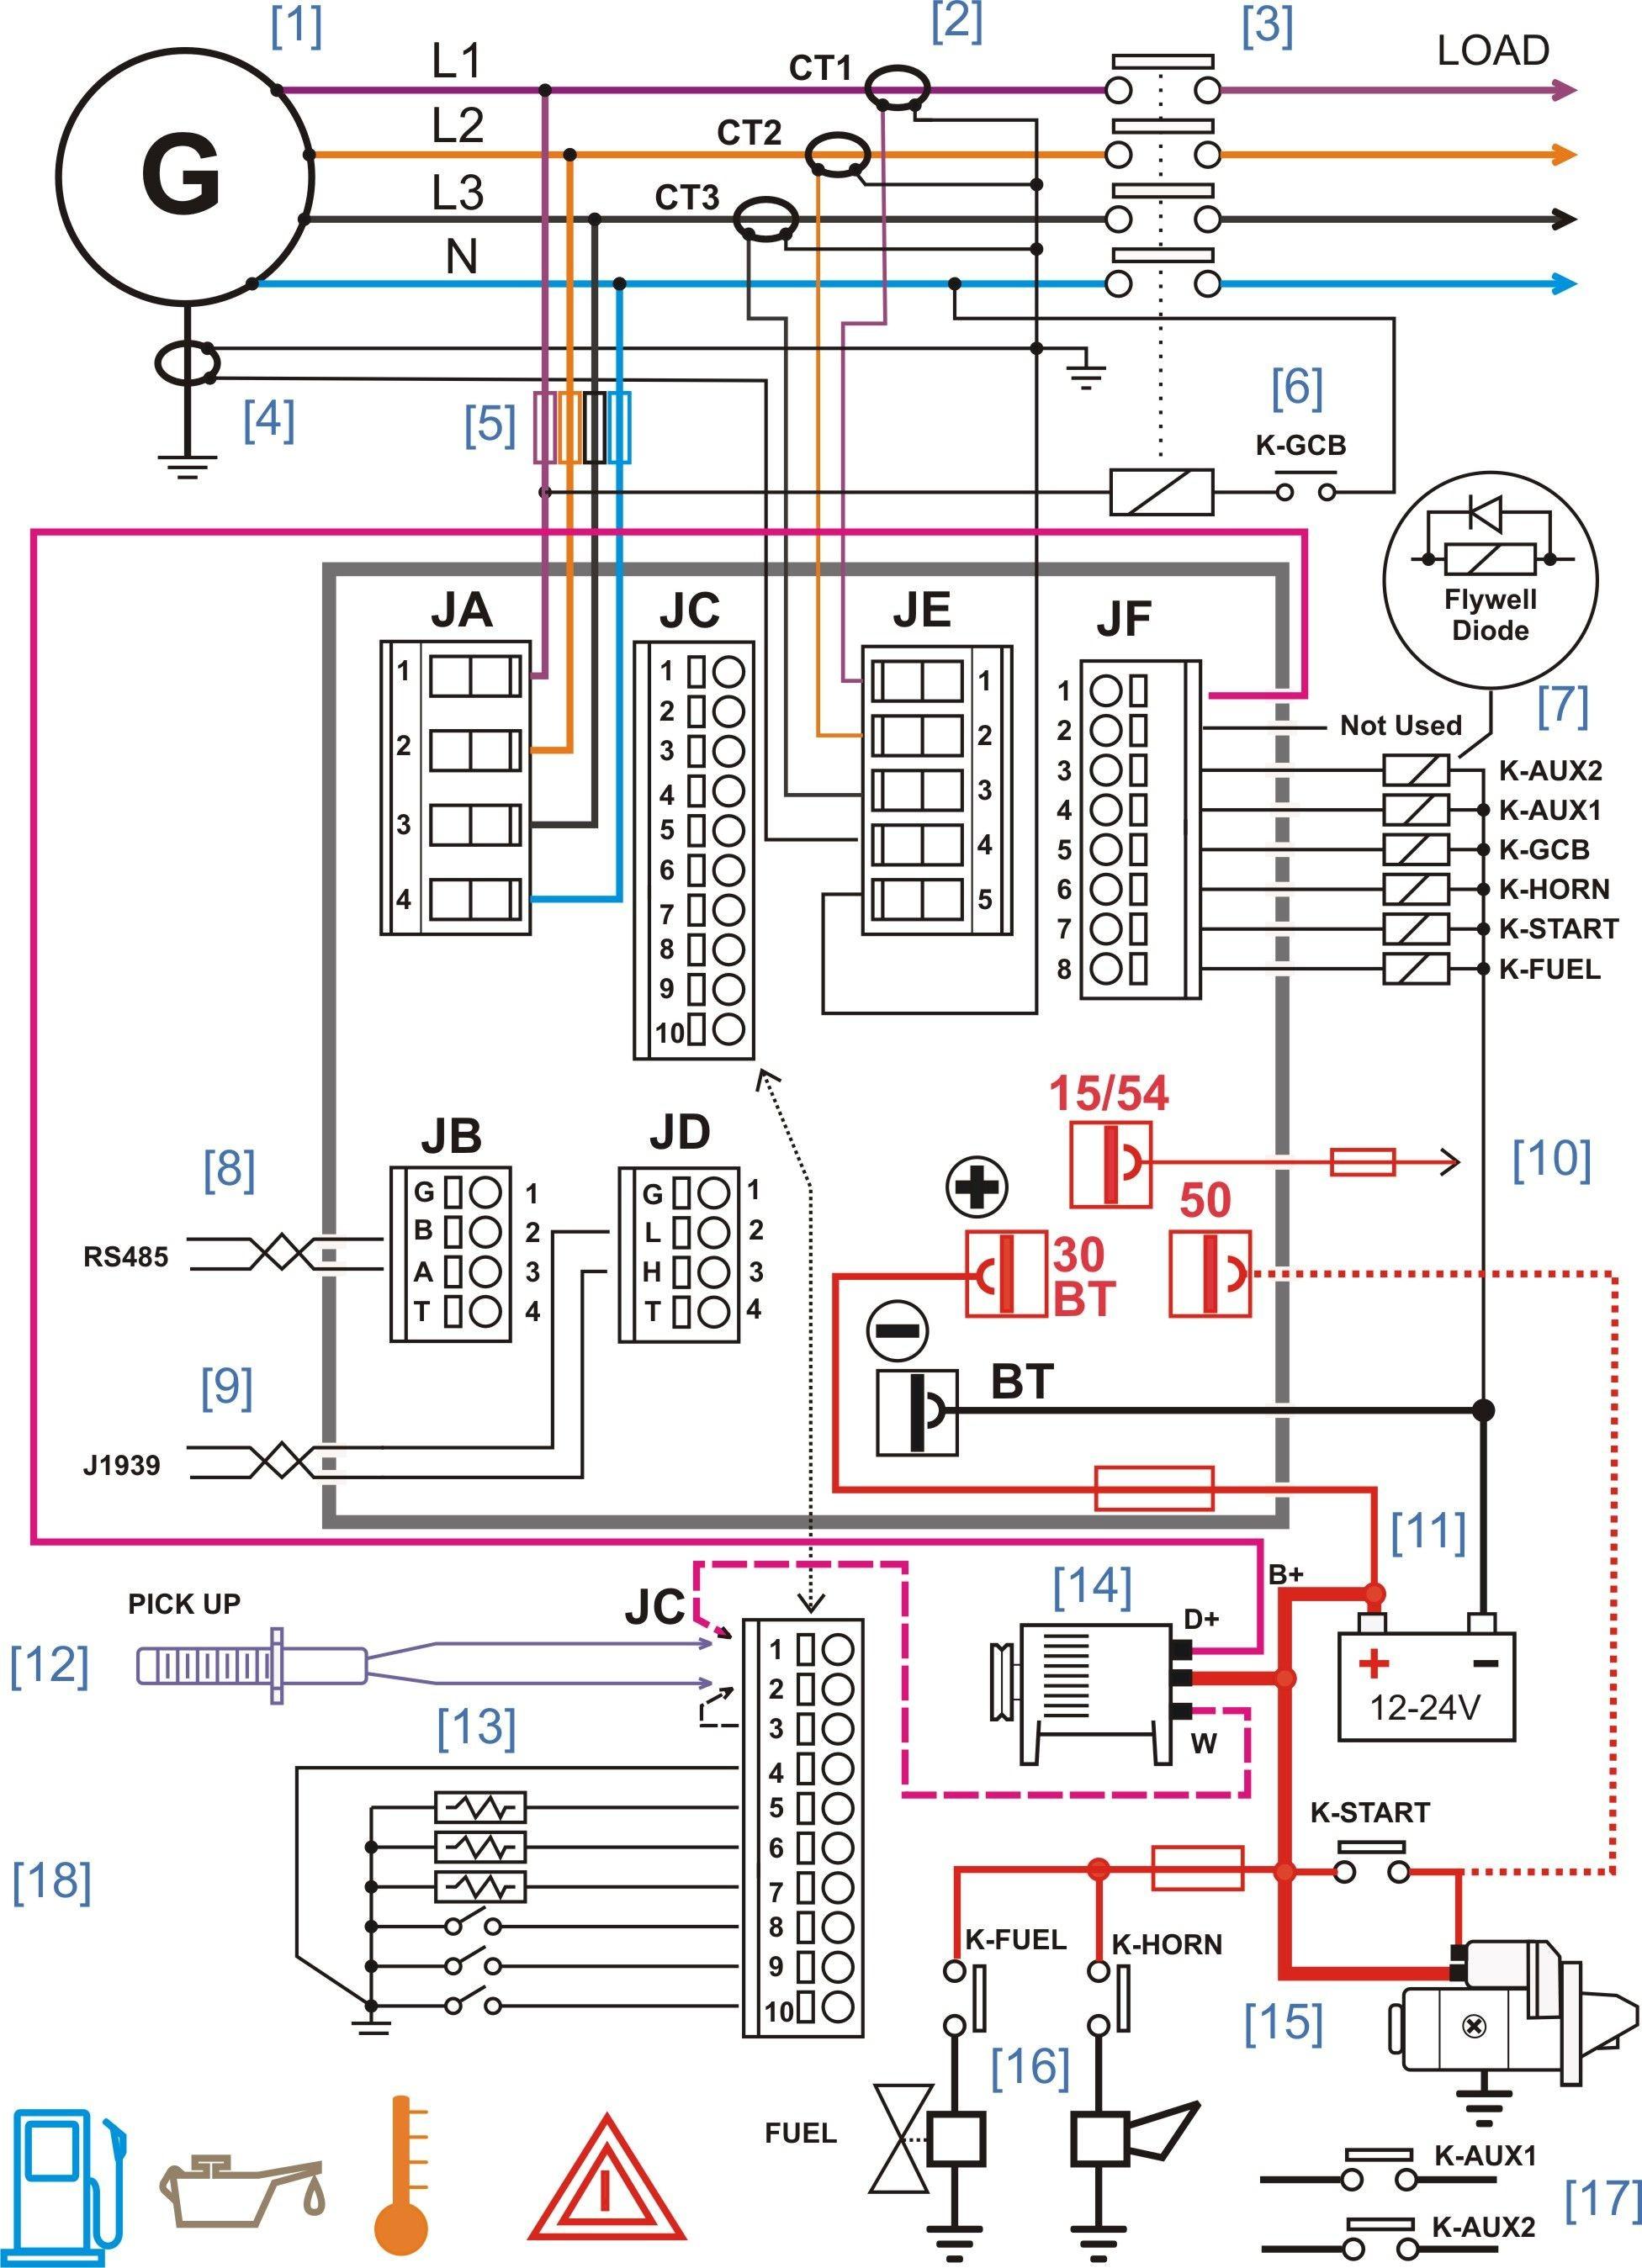 Reliance Transfer Switch Wiring Diagram - Data Wiring Diagram Today - Reliance Generator Transfer Switch Wiring Diagram